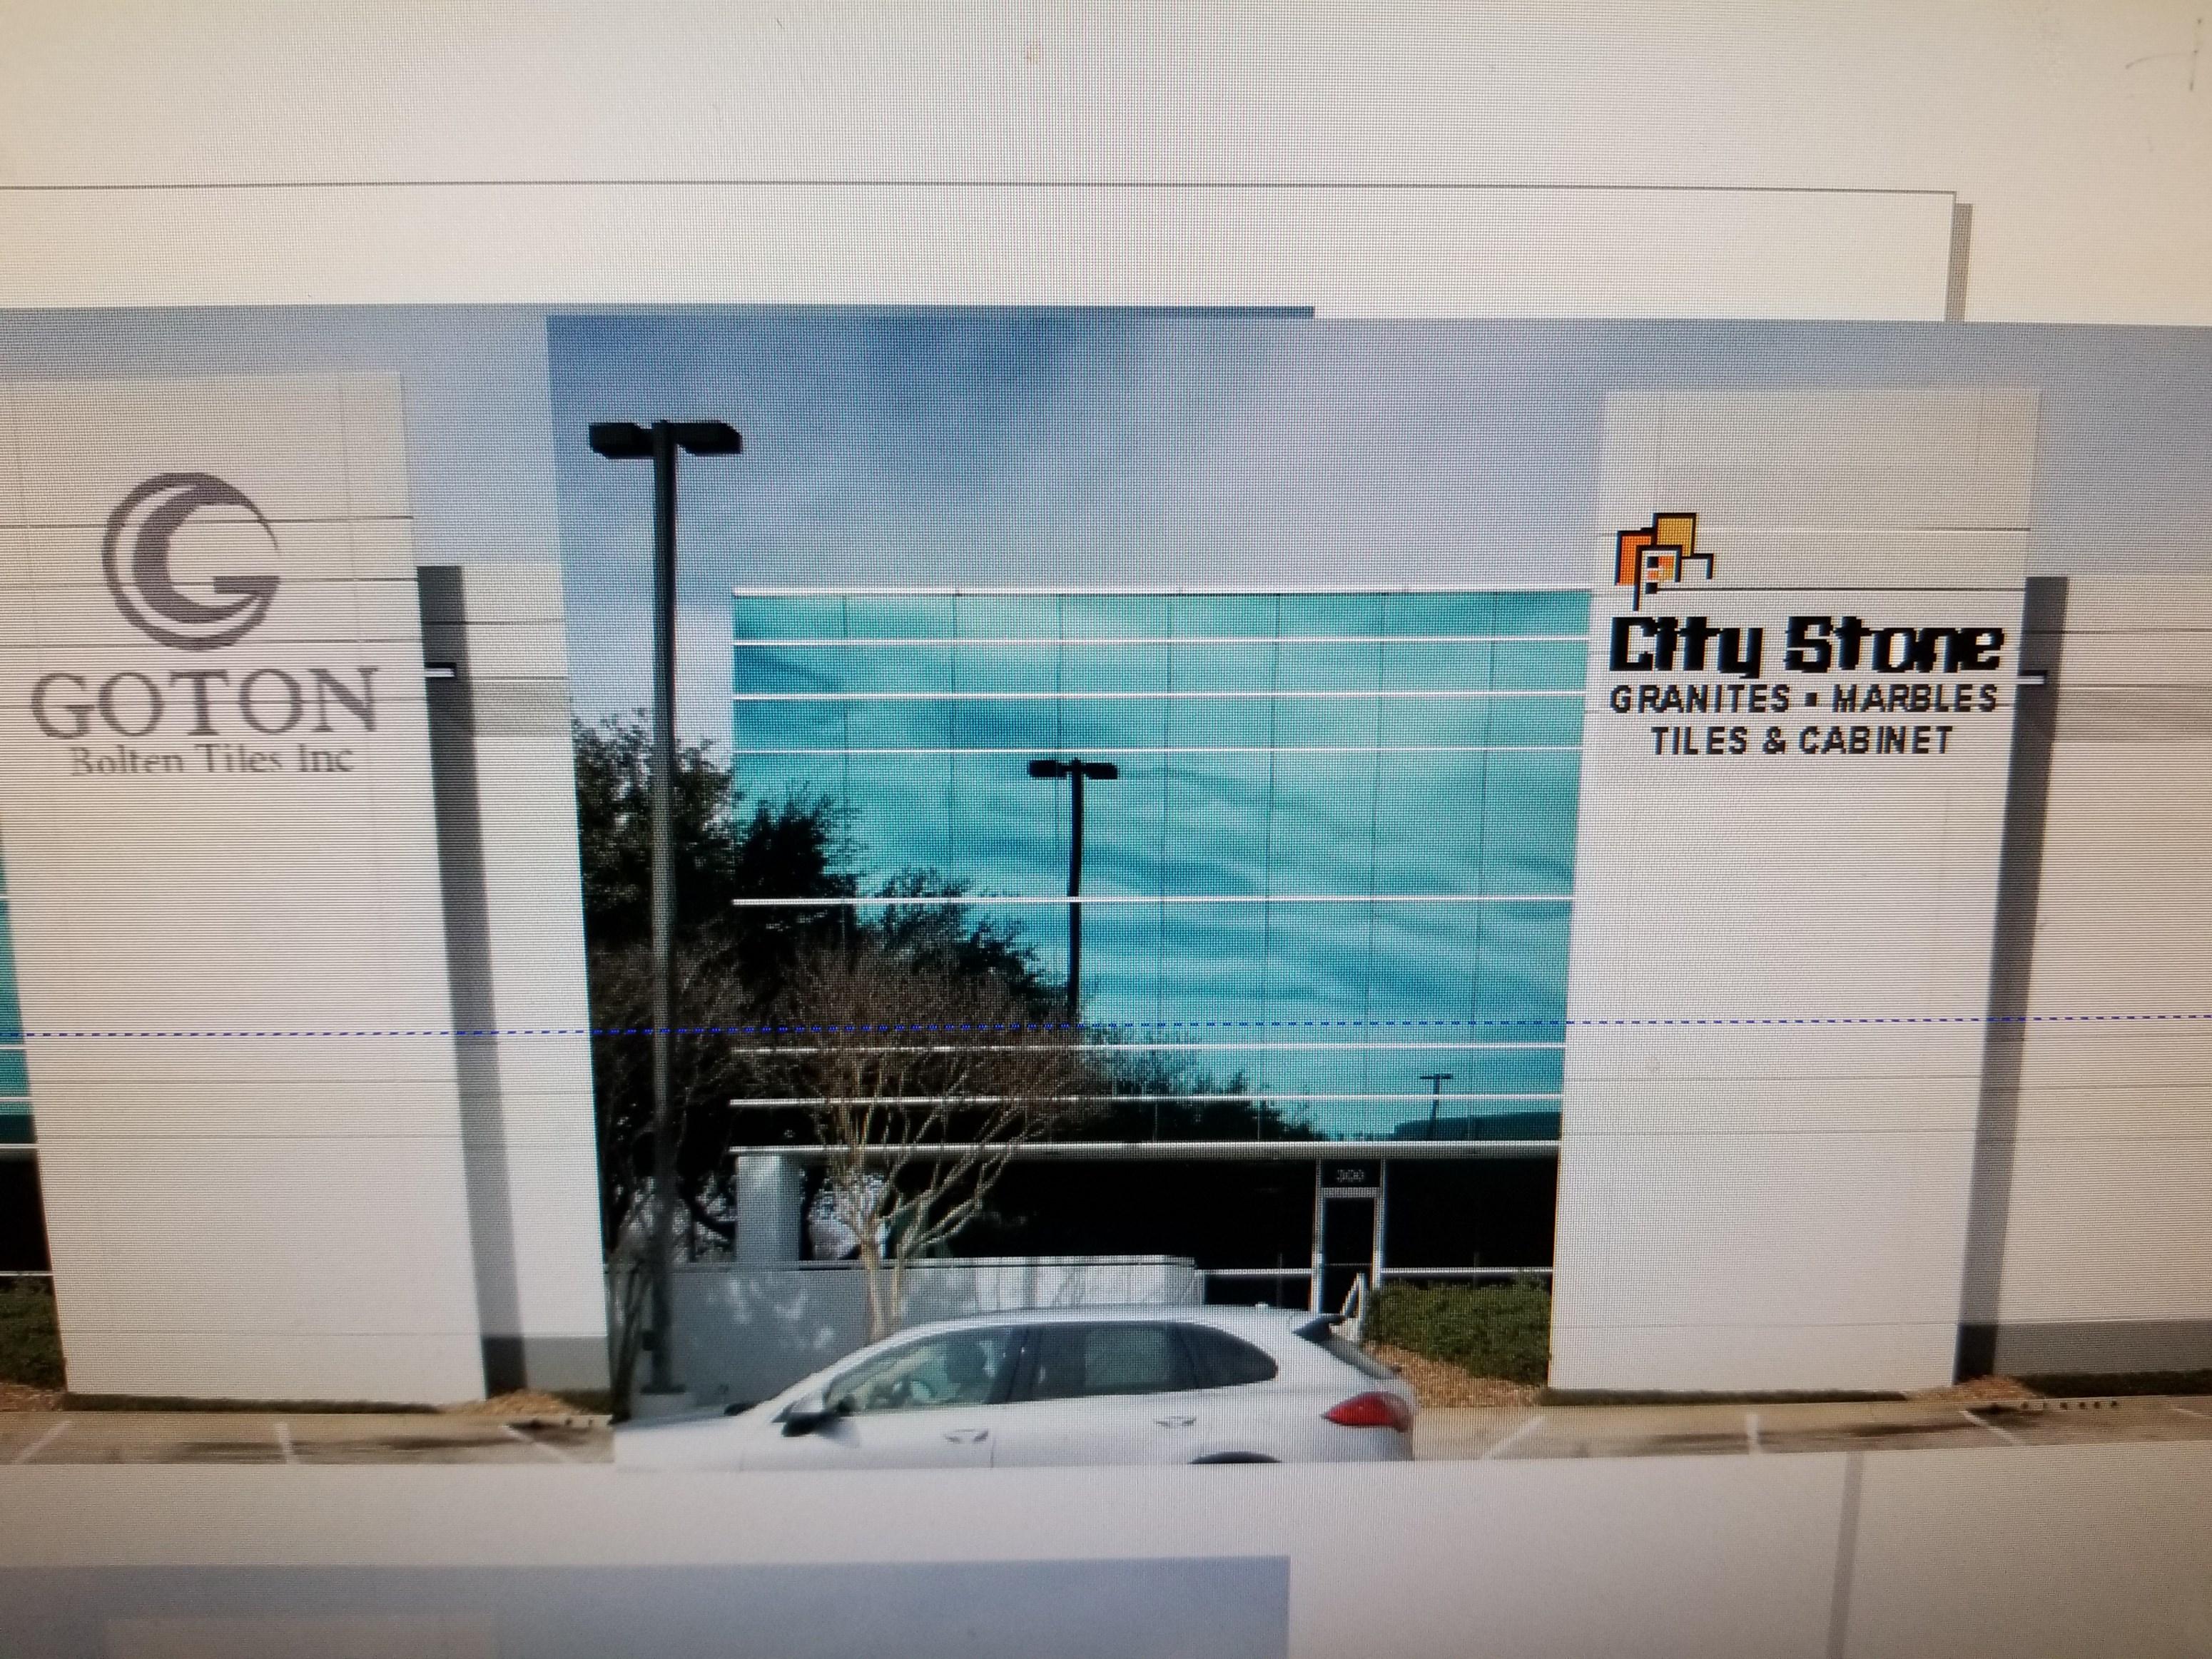 City Of Dallas Careers >> City Stone Of Dallas Careers Jobs Dallas Tx Sulekha